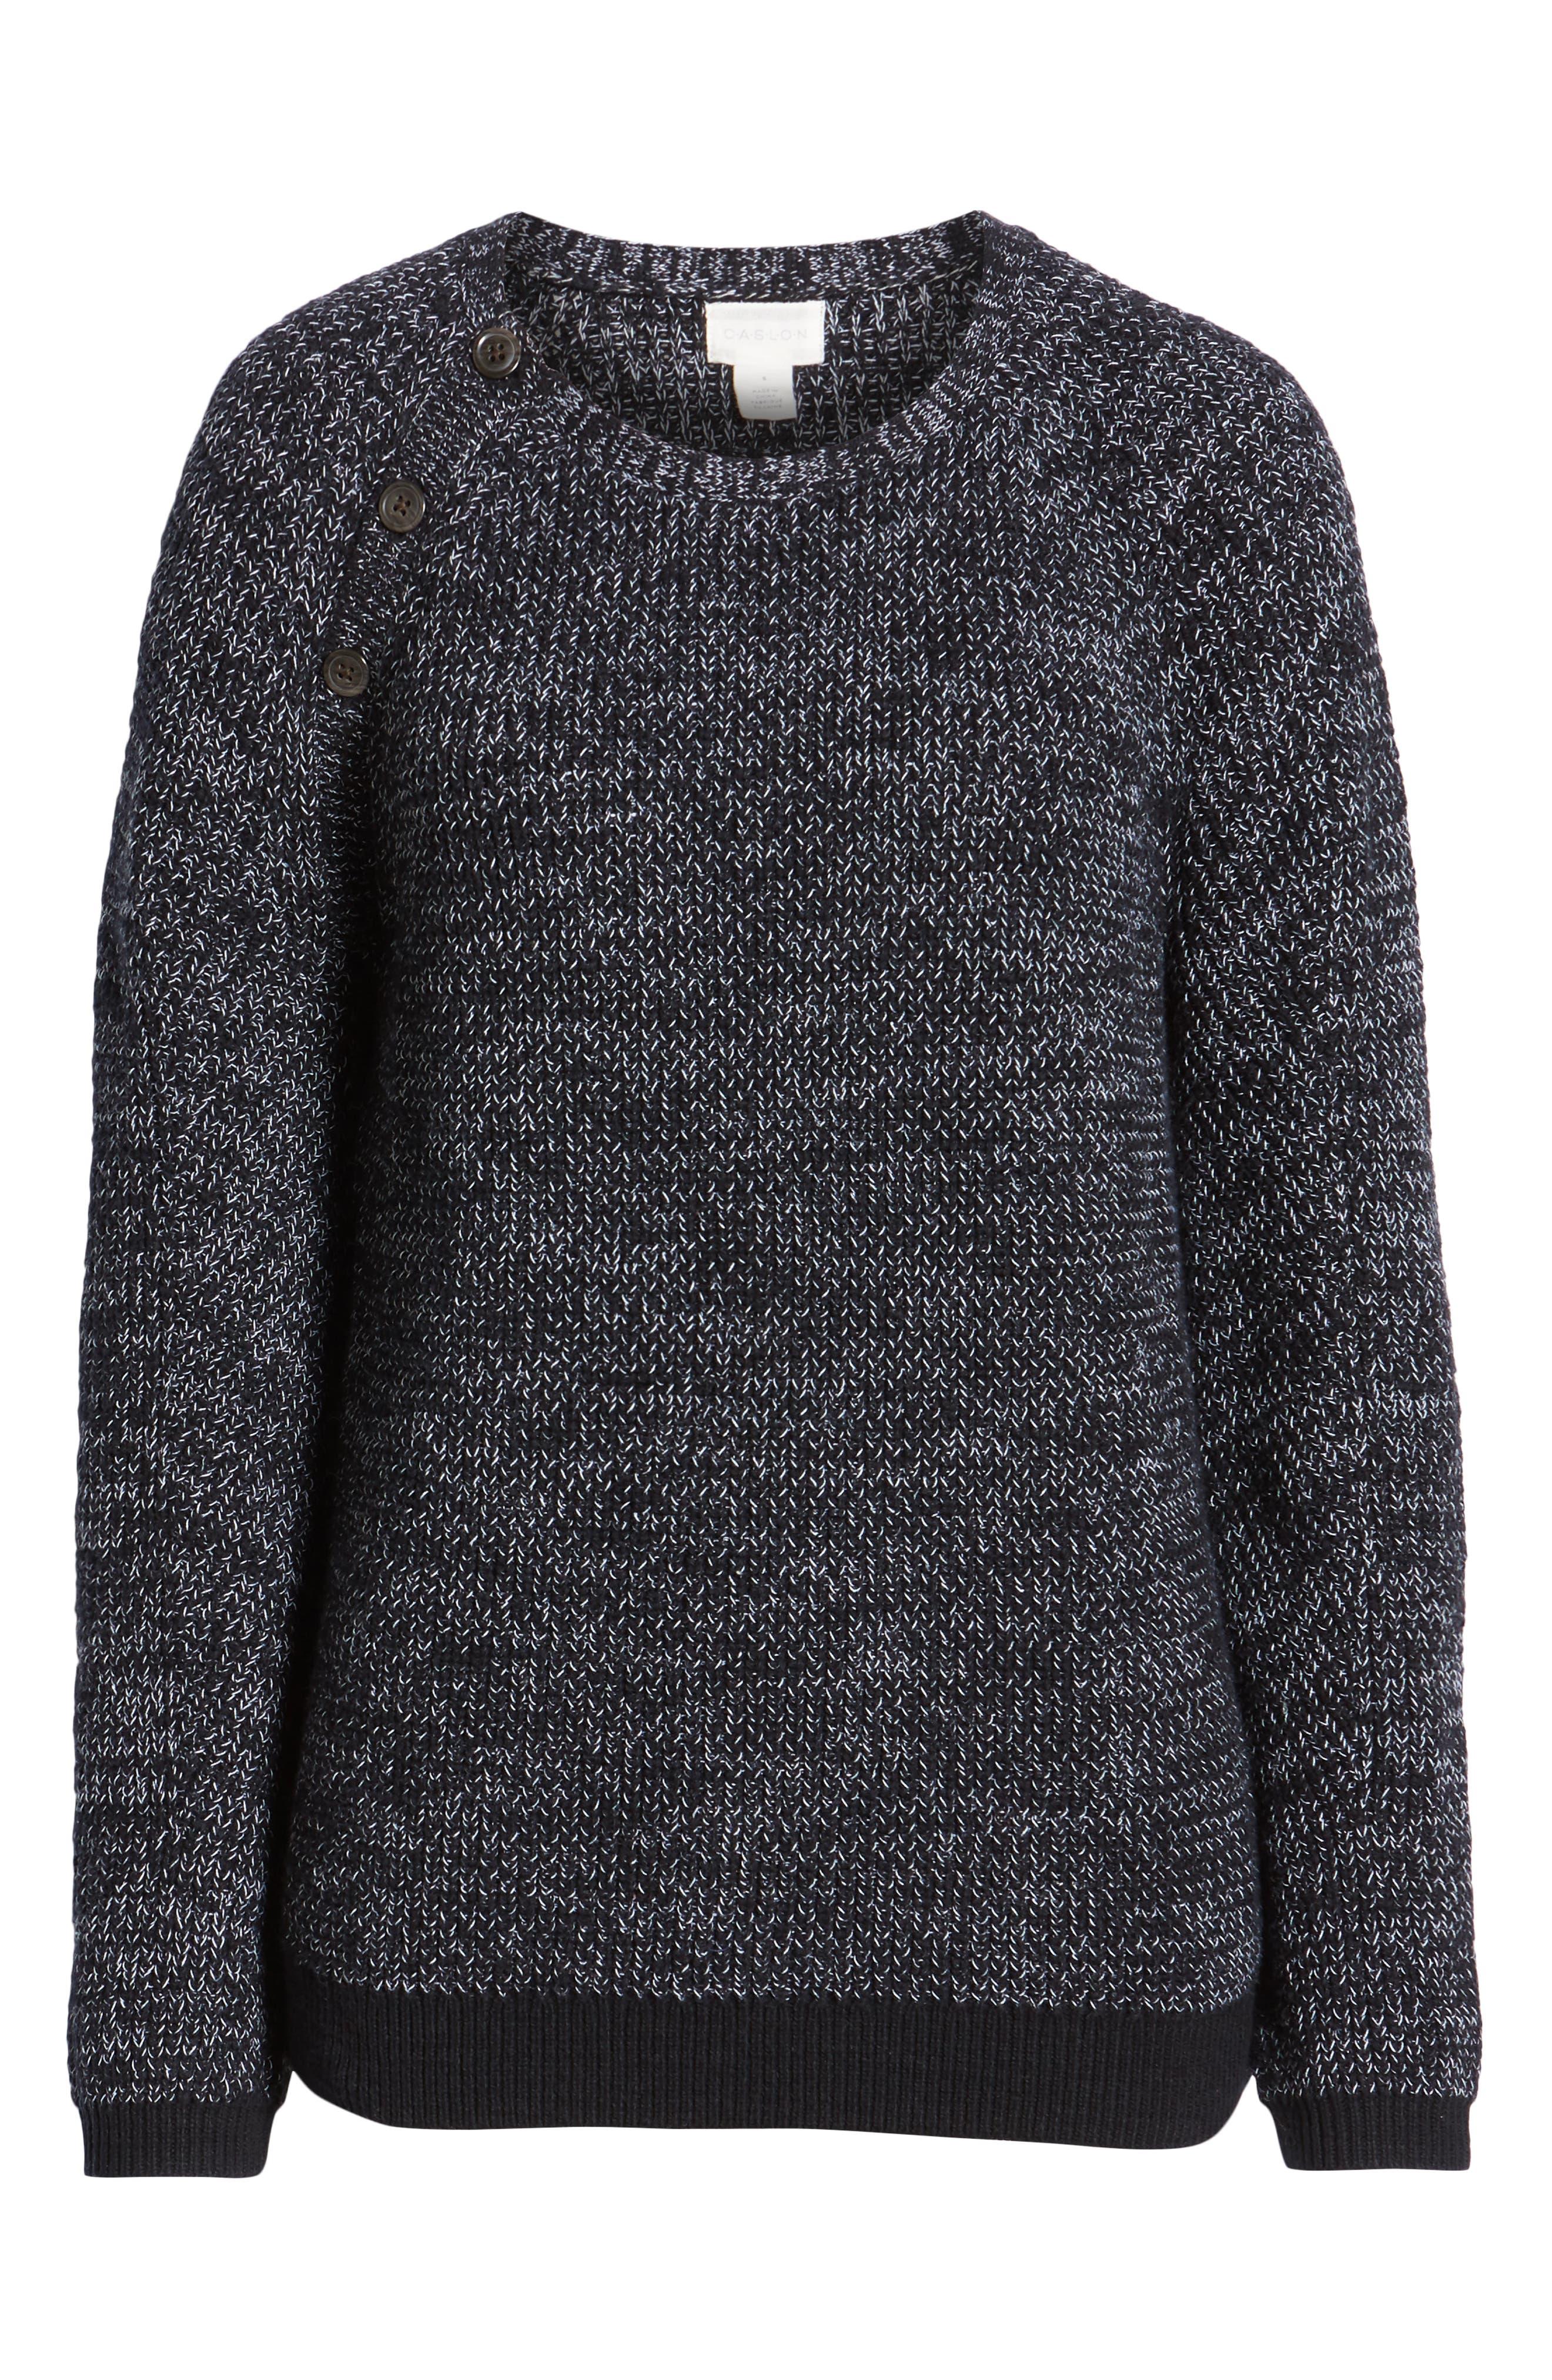 Raglan Sleeve Sweater,                             Alternate thumbnail 6, color,                             BLACK CREW MARL